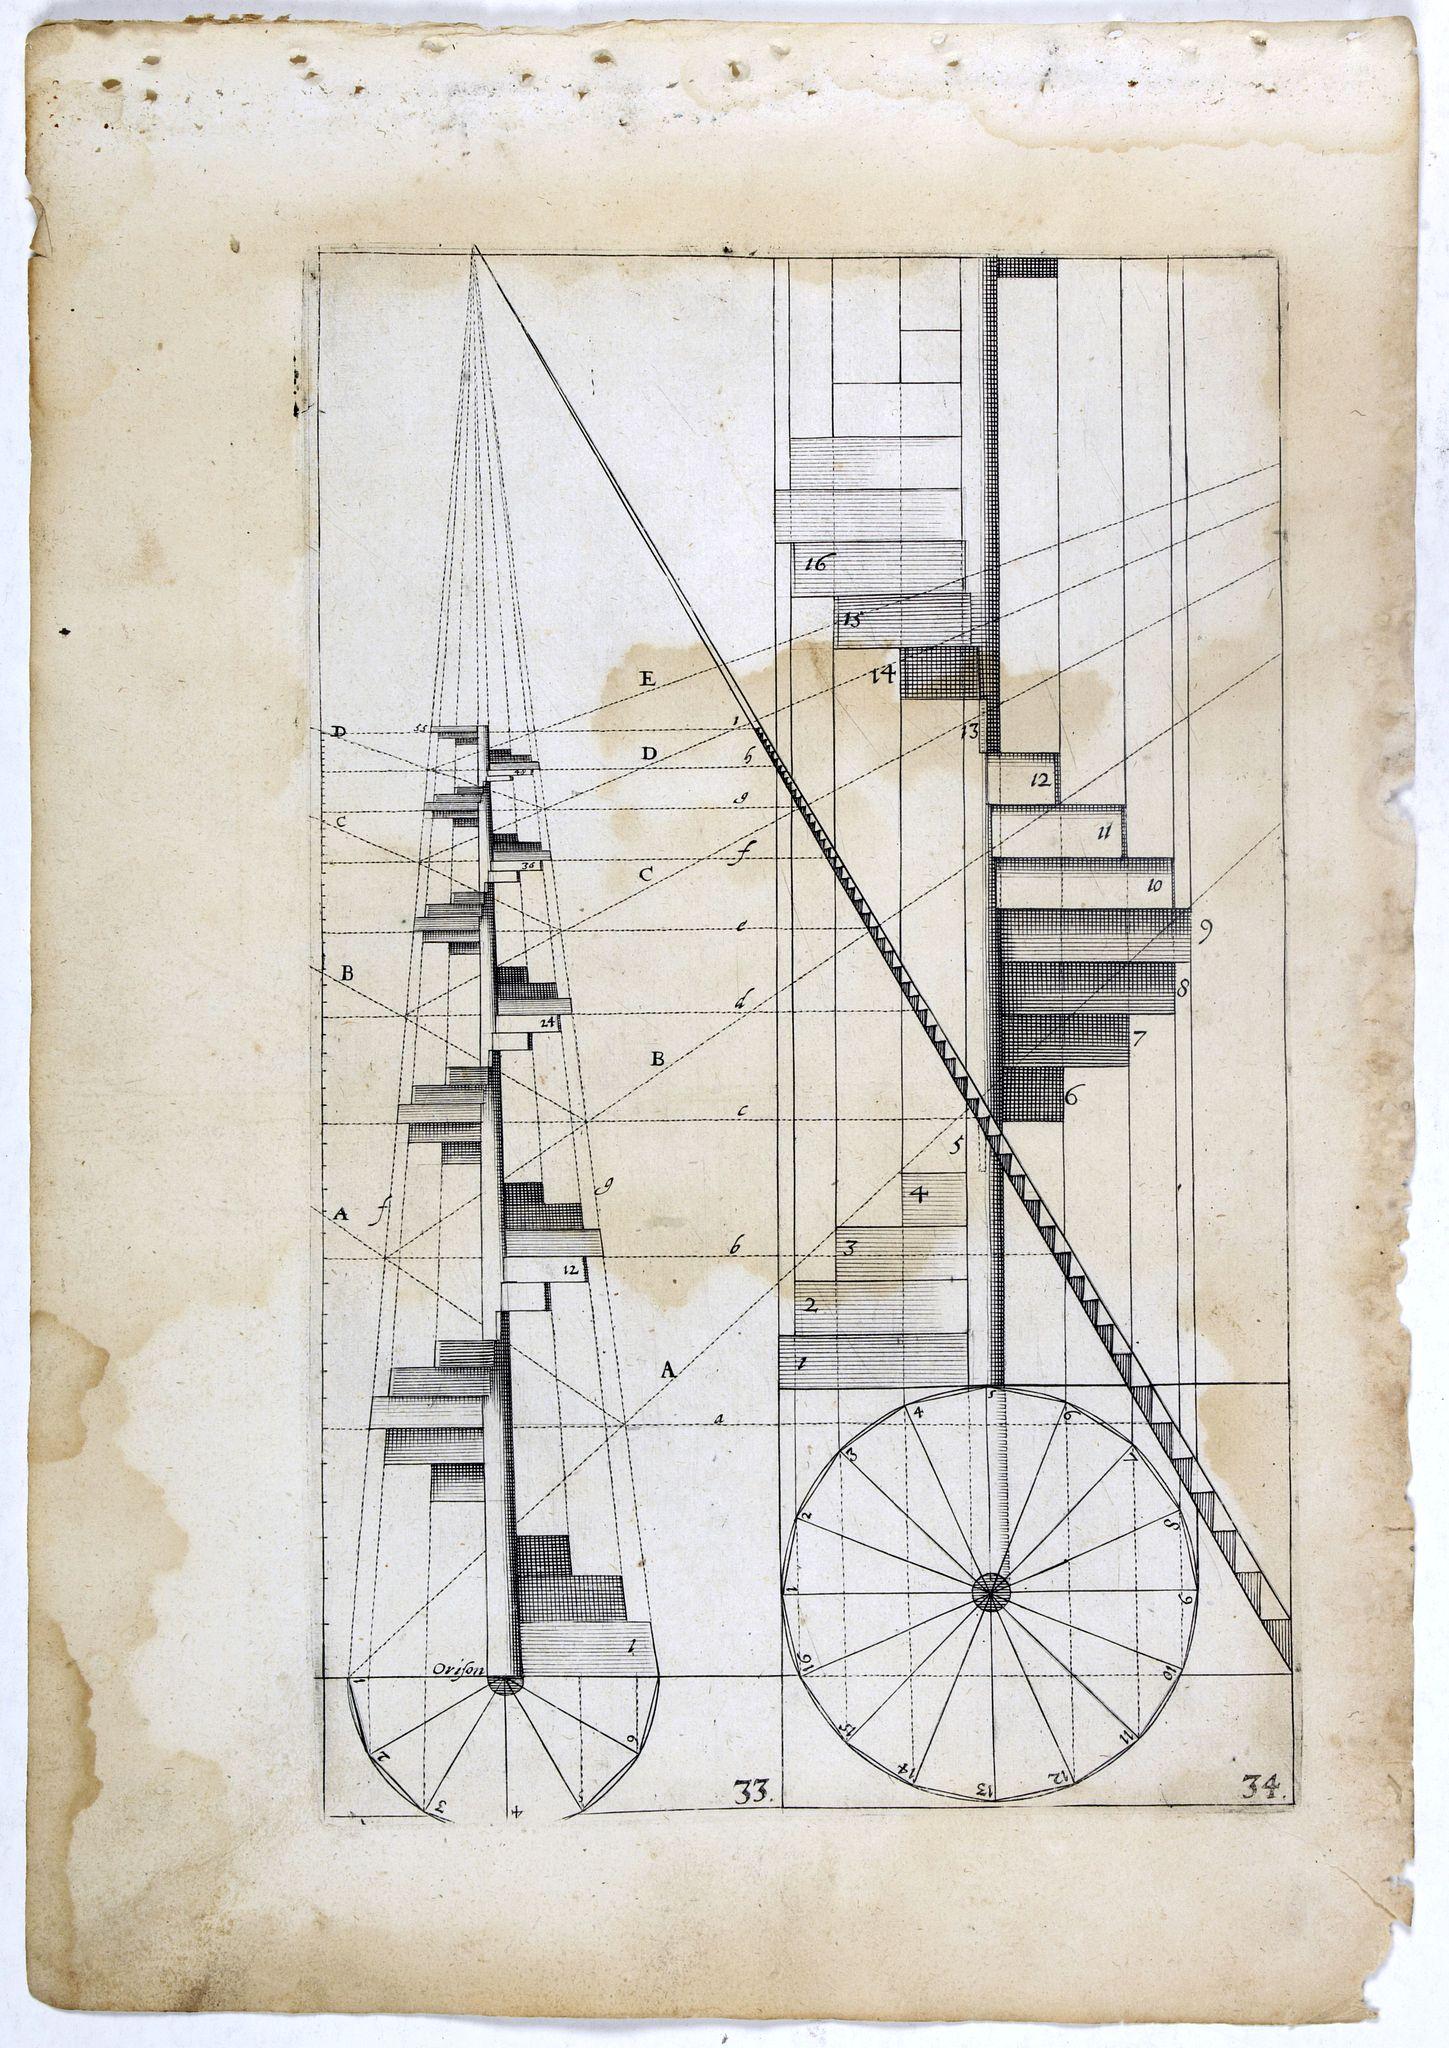 VREDEMAN DE VRIES, J. / HONDIUS, H. -  Perspective print by Vredeman de Vries. 33 / 34.